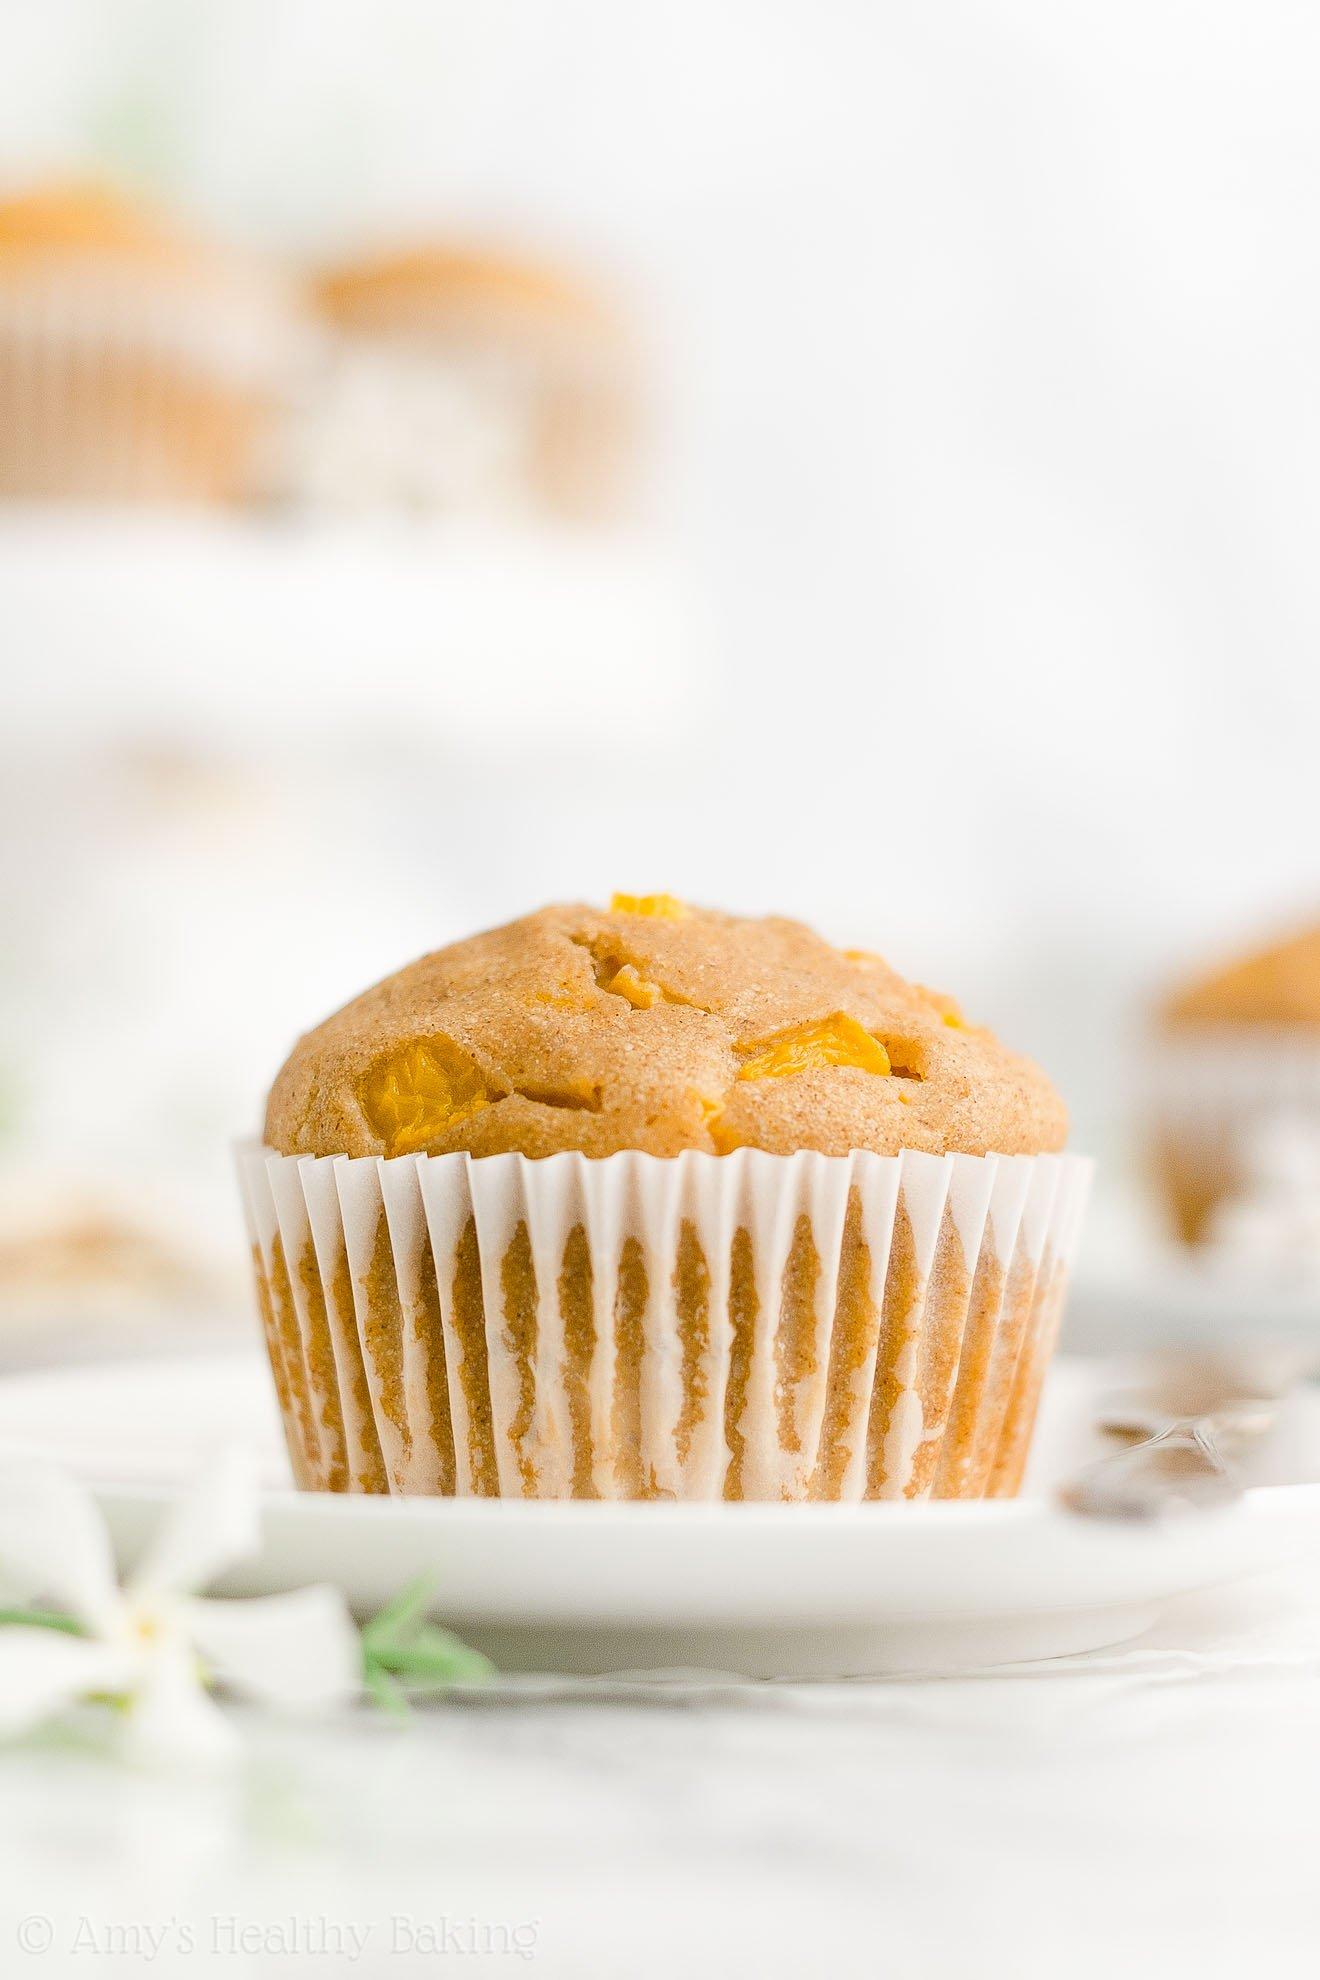 Ultimate Best Easy Healthy Whole Wheat Low Fat Greek Yogurt Peach Muffins